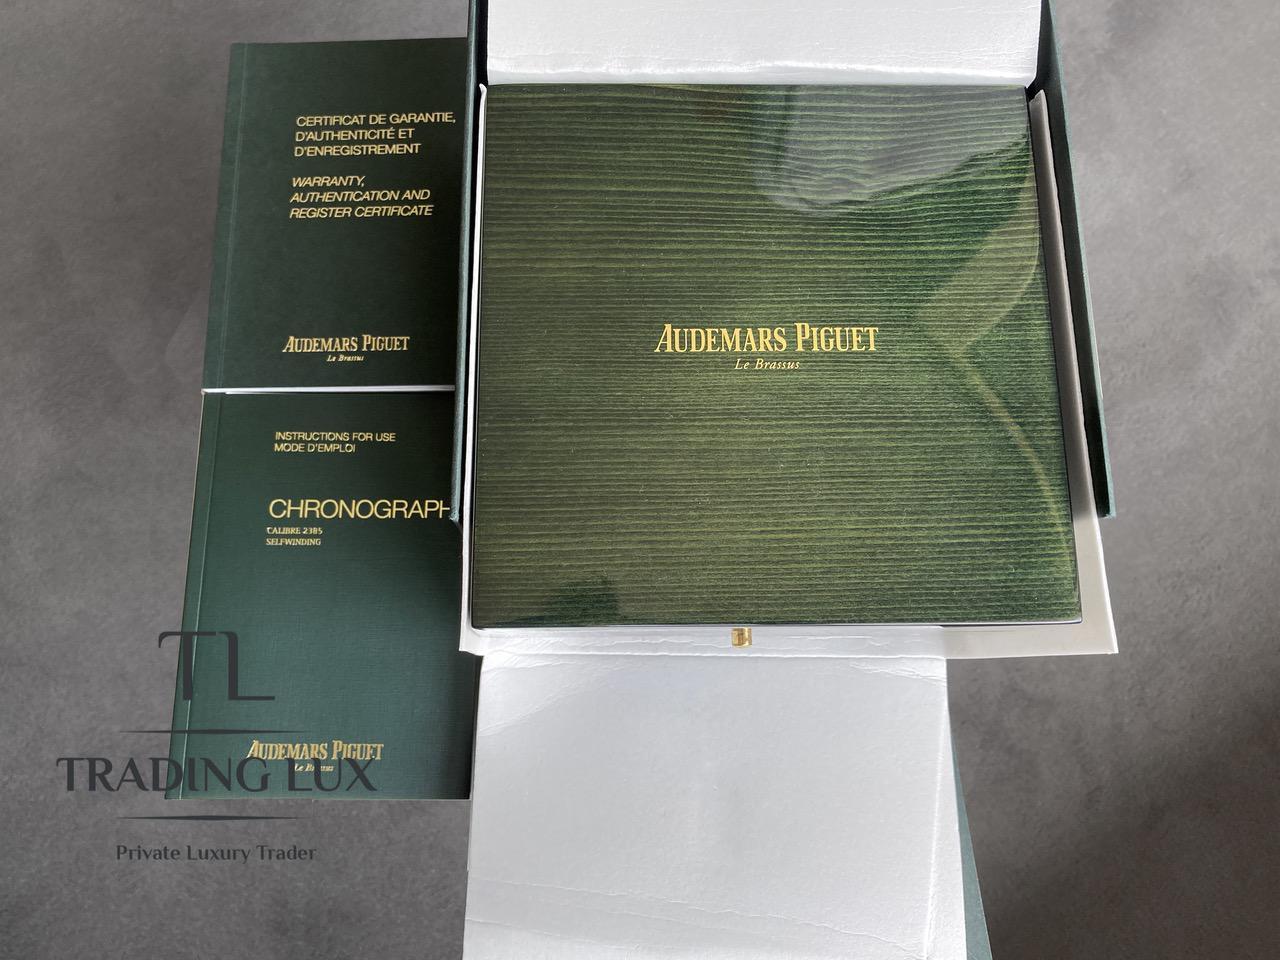 Audemars-Piguet-Royal-Oak-Chronograph-26331ST.OO_.1220ST.01-11